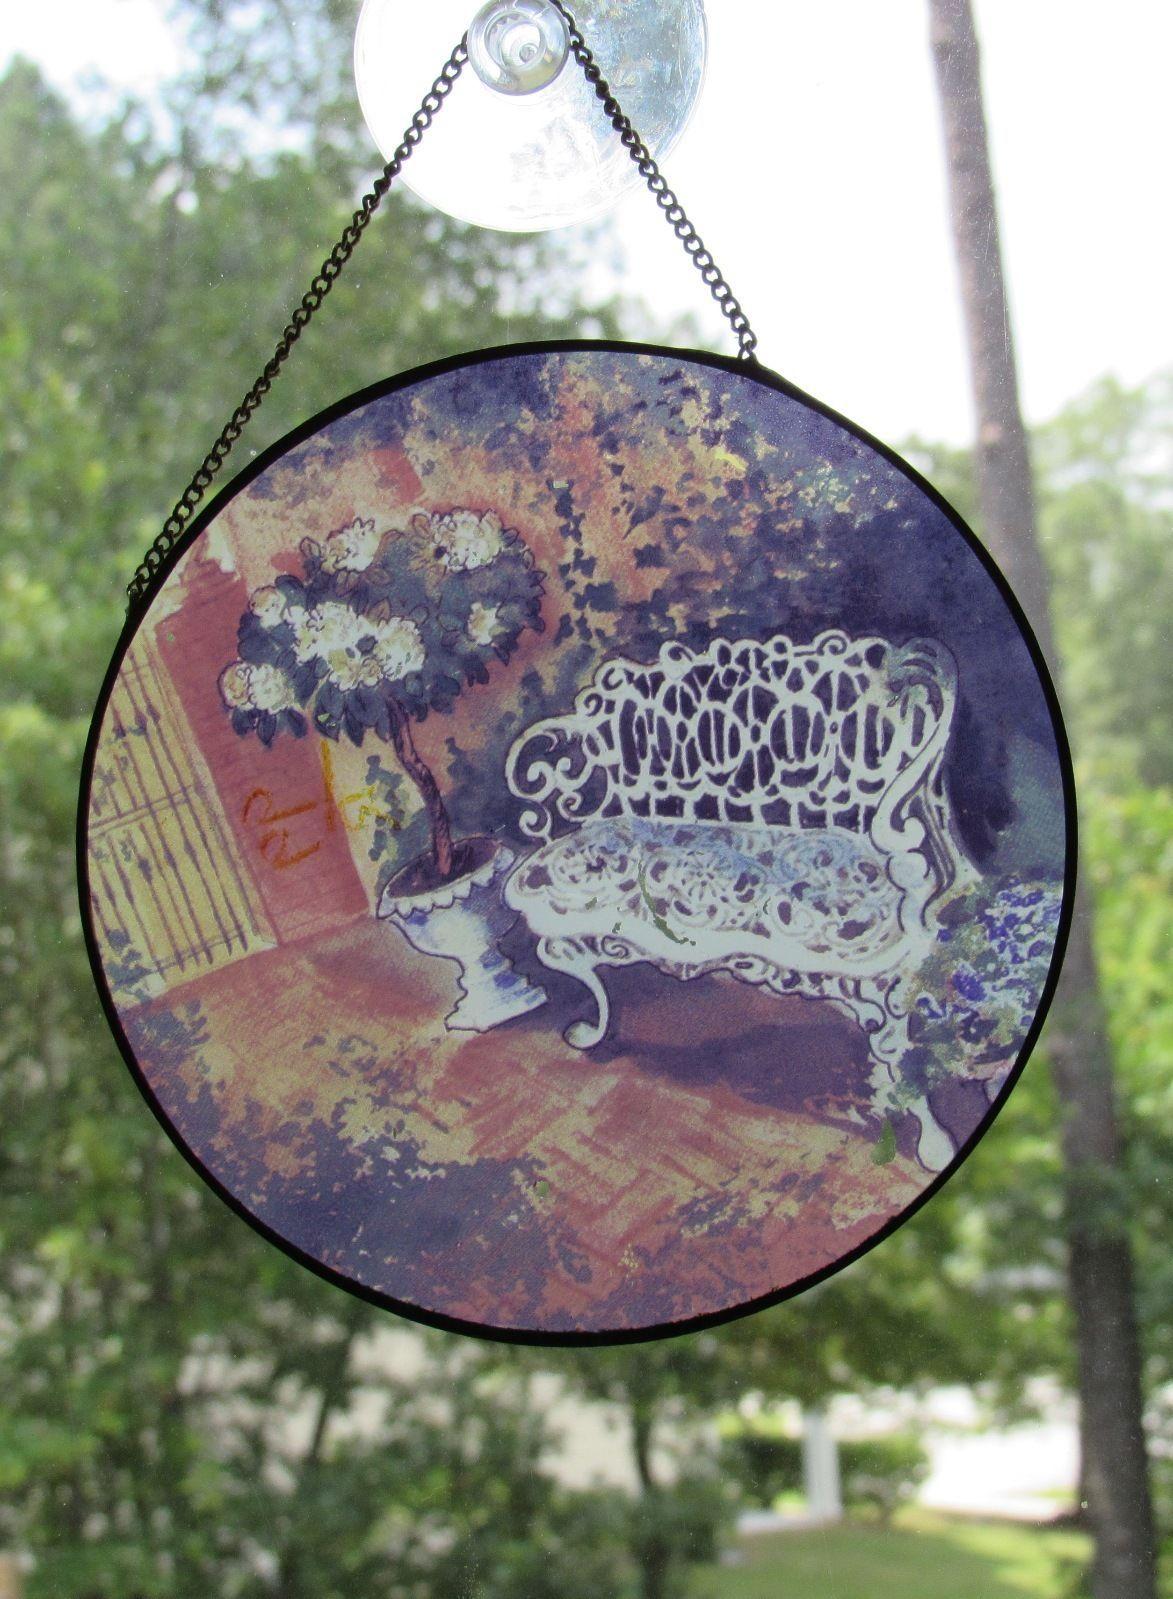 Vintage Art Glass Sun-Catcher Floral Garden - White Garden Bench Multi-Color